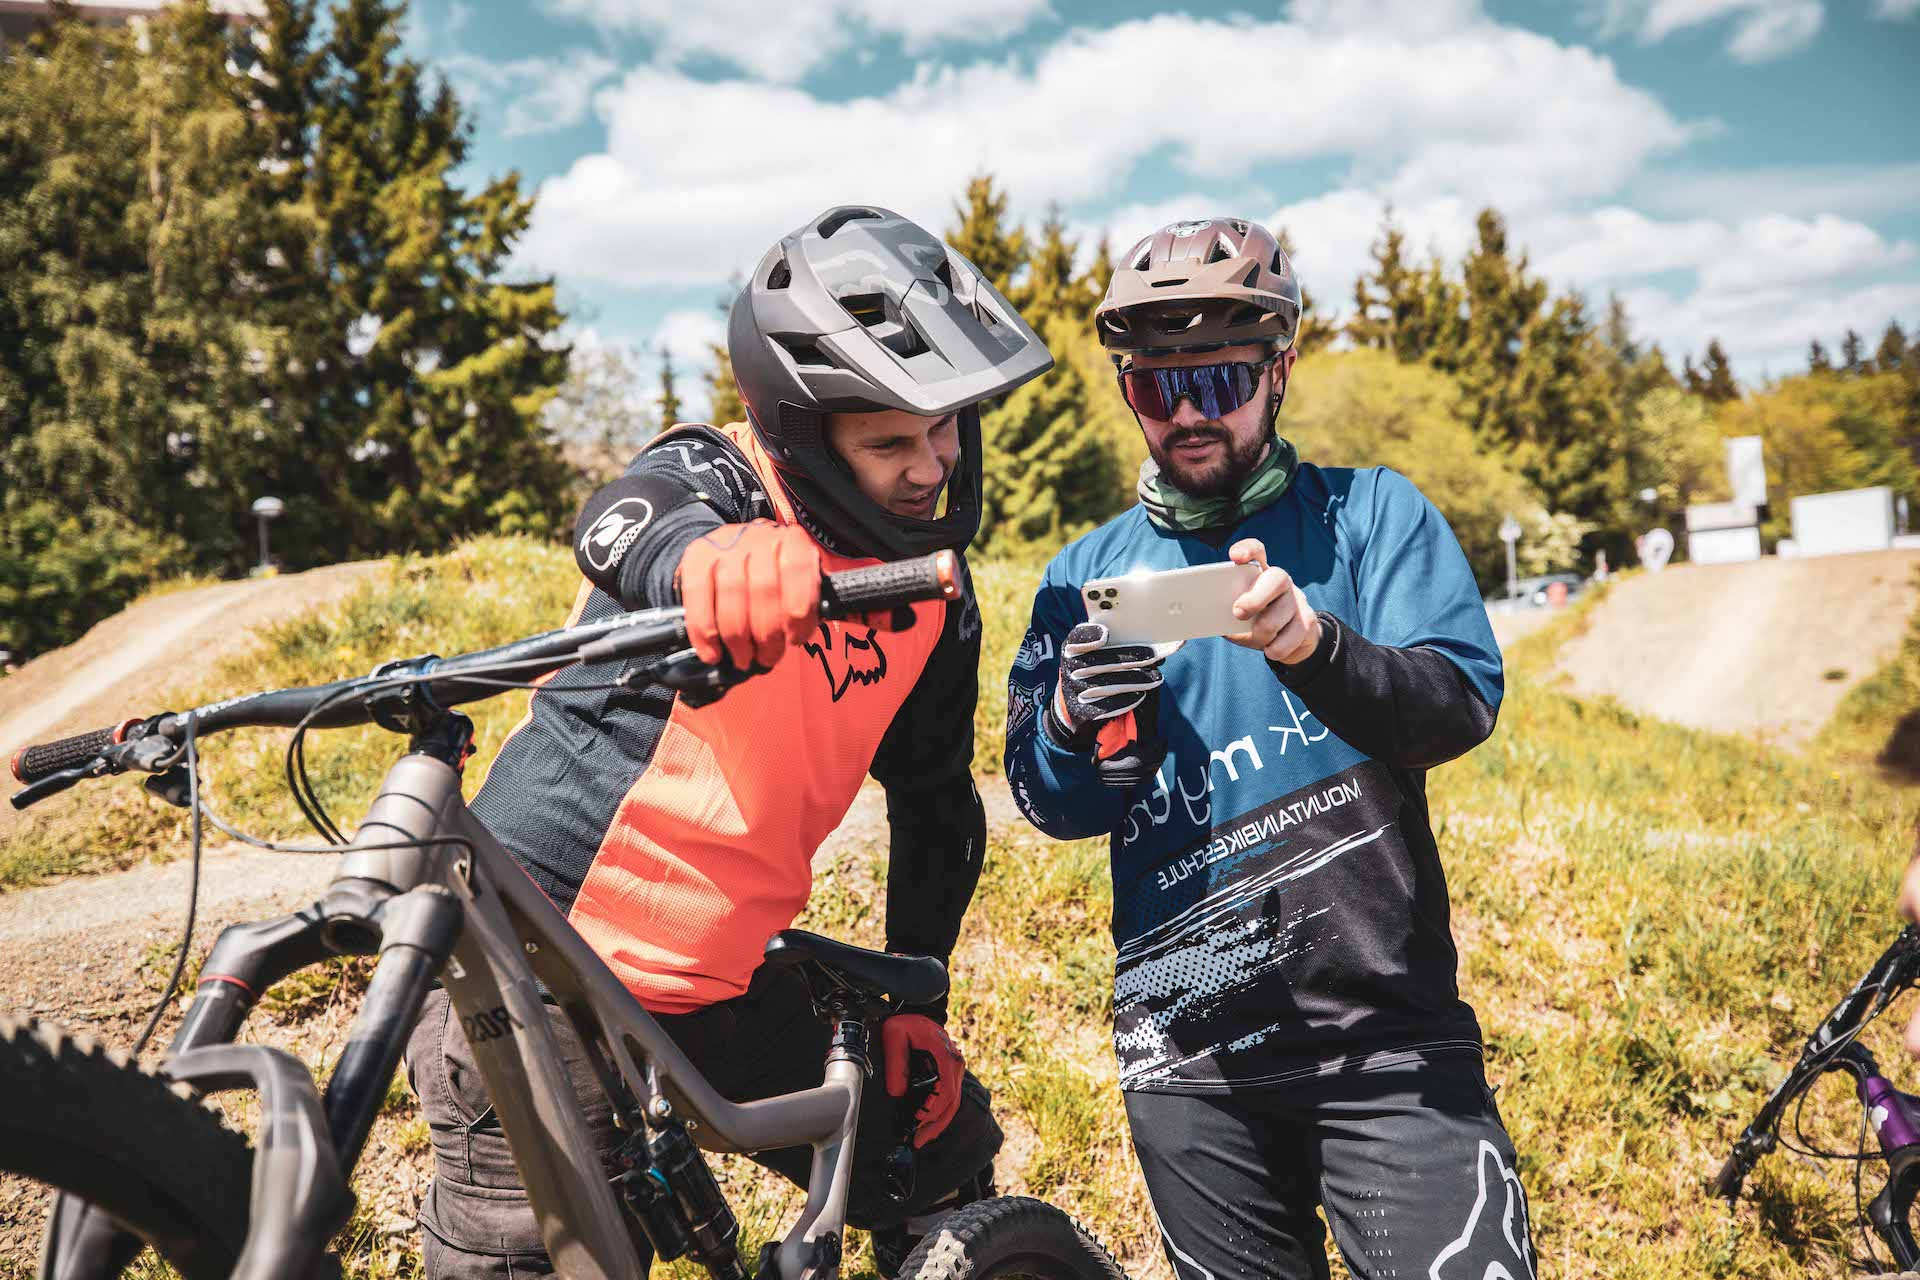 Bikepark-Basics-Fahrtechnik-Kurs-Samerberg-Fahrtechnik-Training-Rock-my-Trail-Bikeschule-10